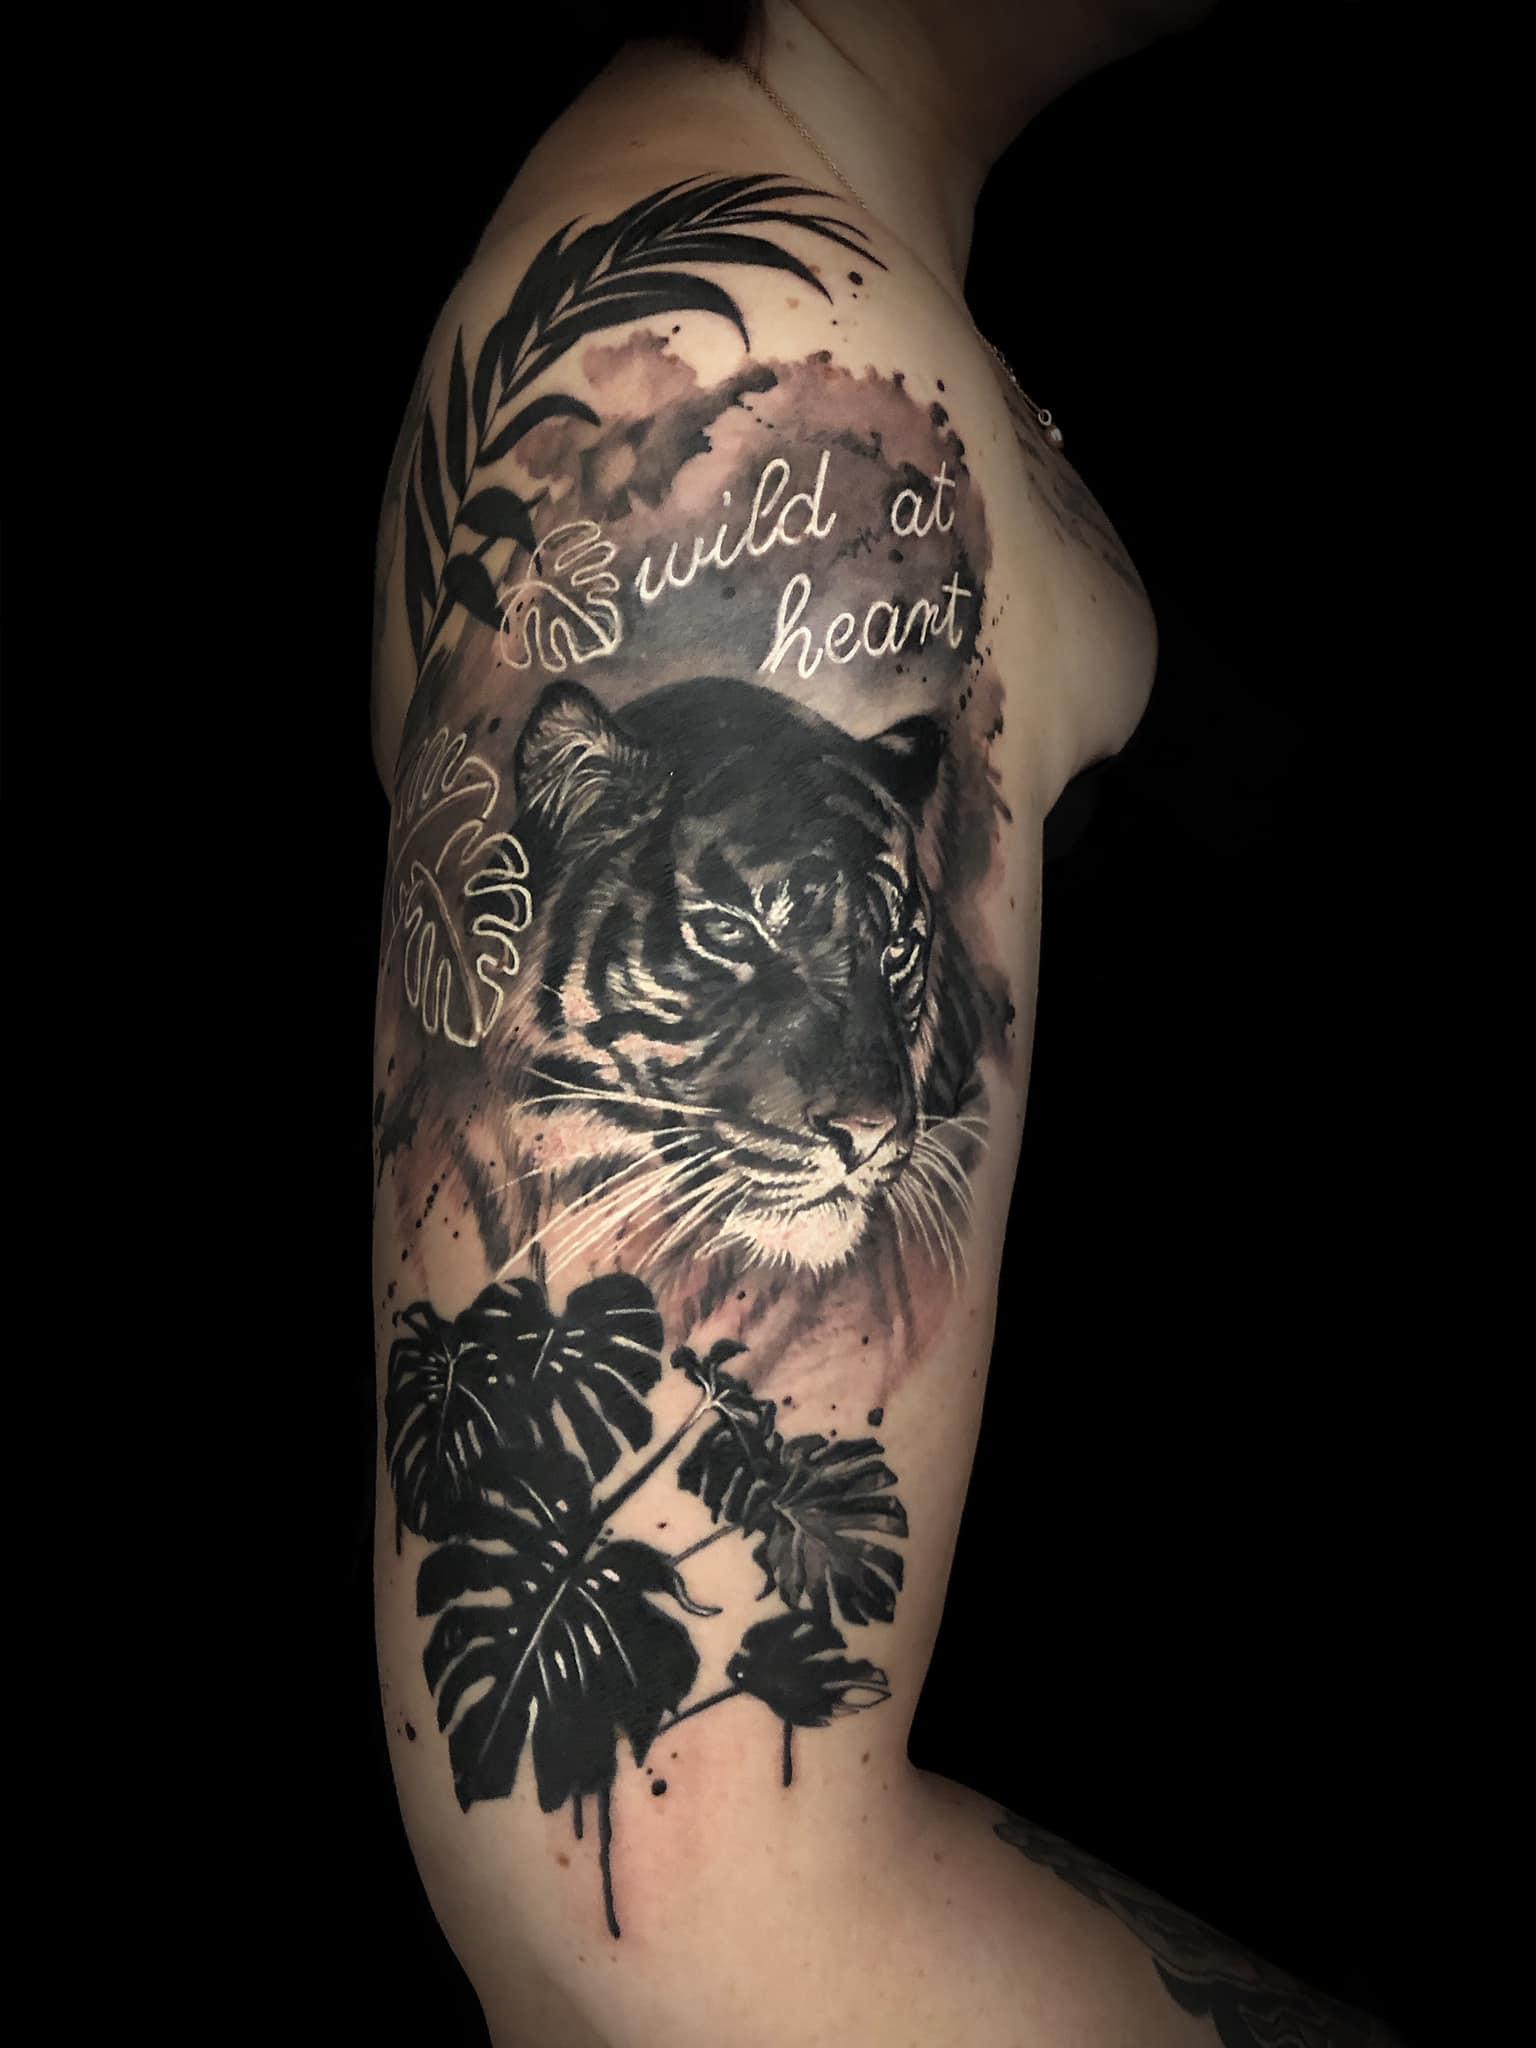 Maui Meherzi - Opus Magnum Tattoo Studio Wien - Fotorealismus - Fotorealistischer Löwe